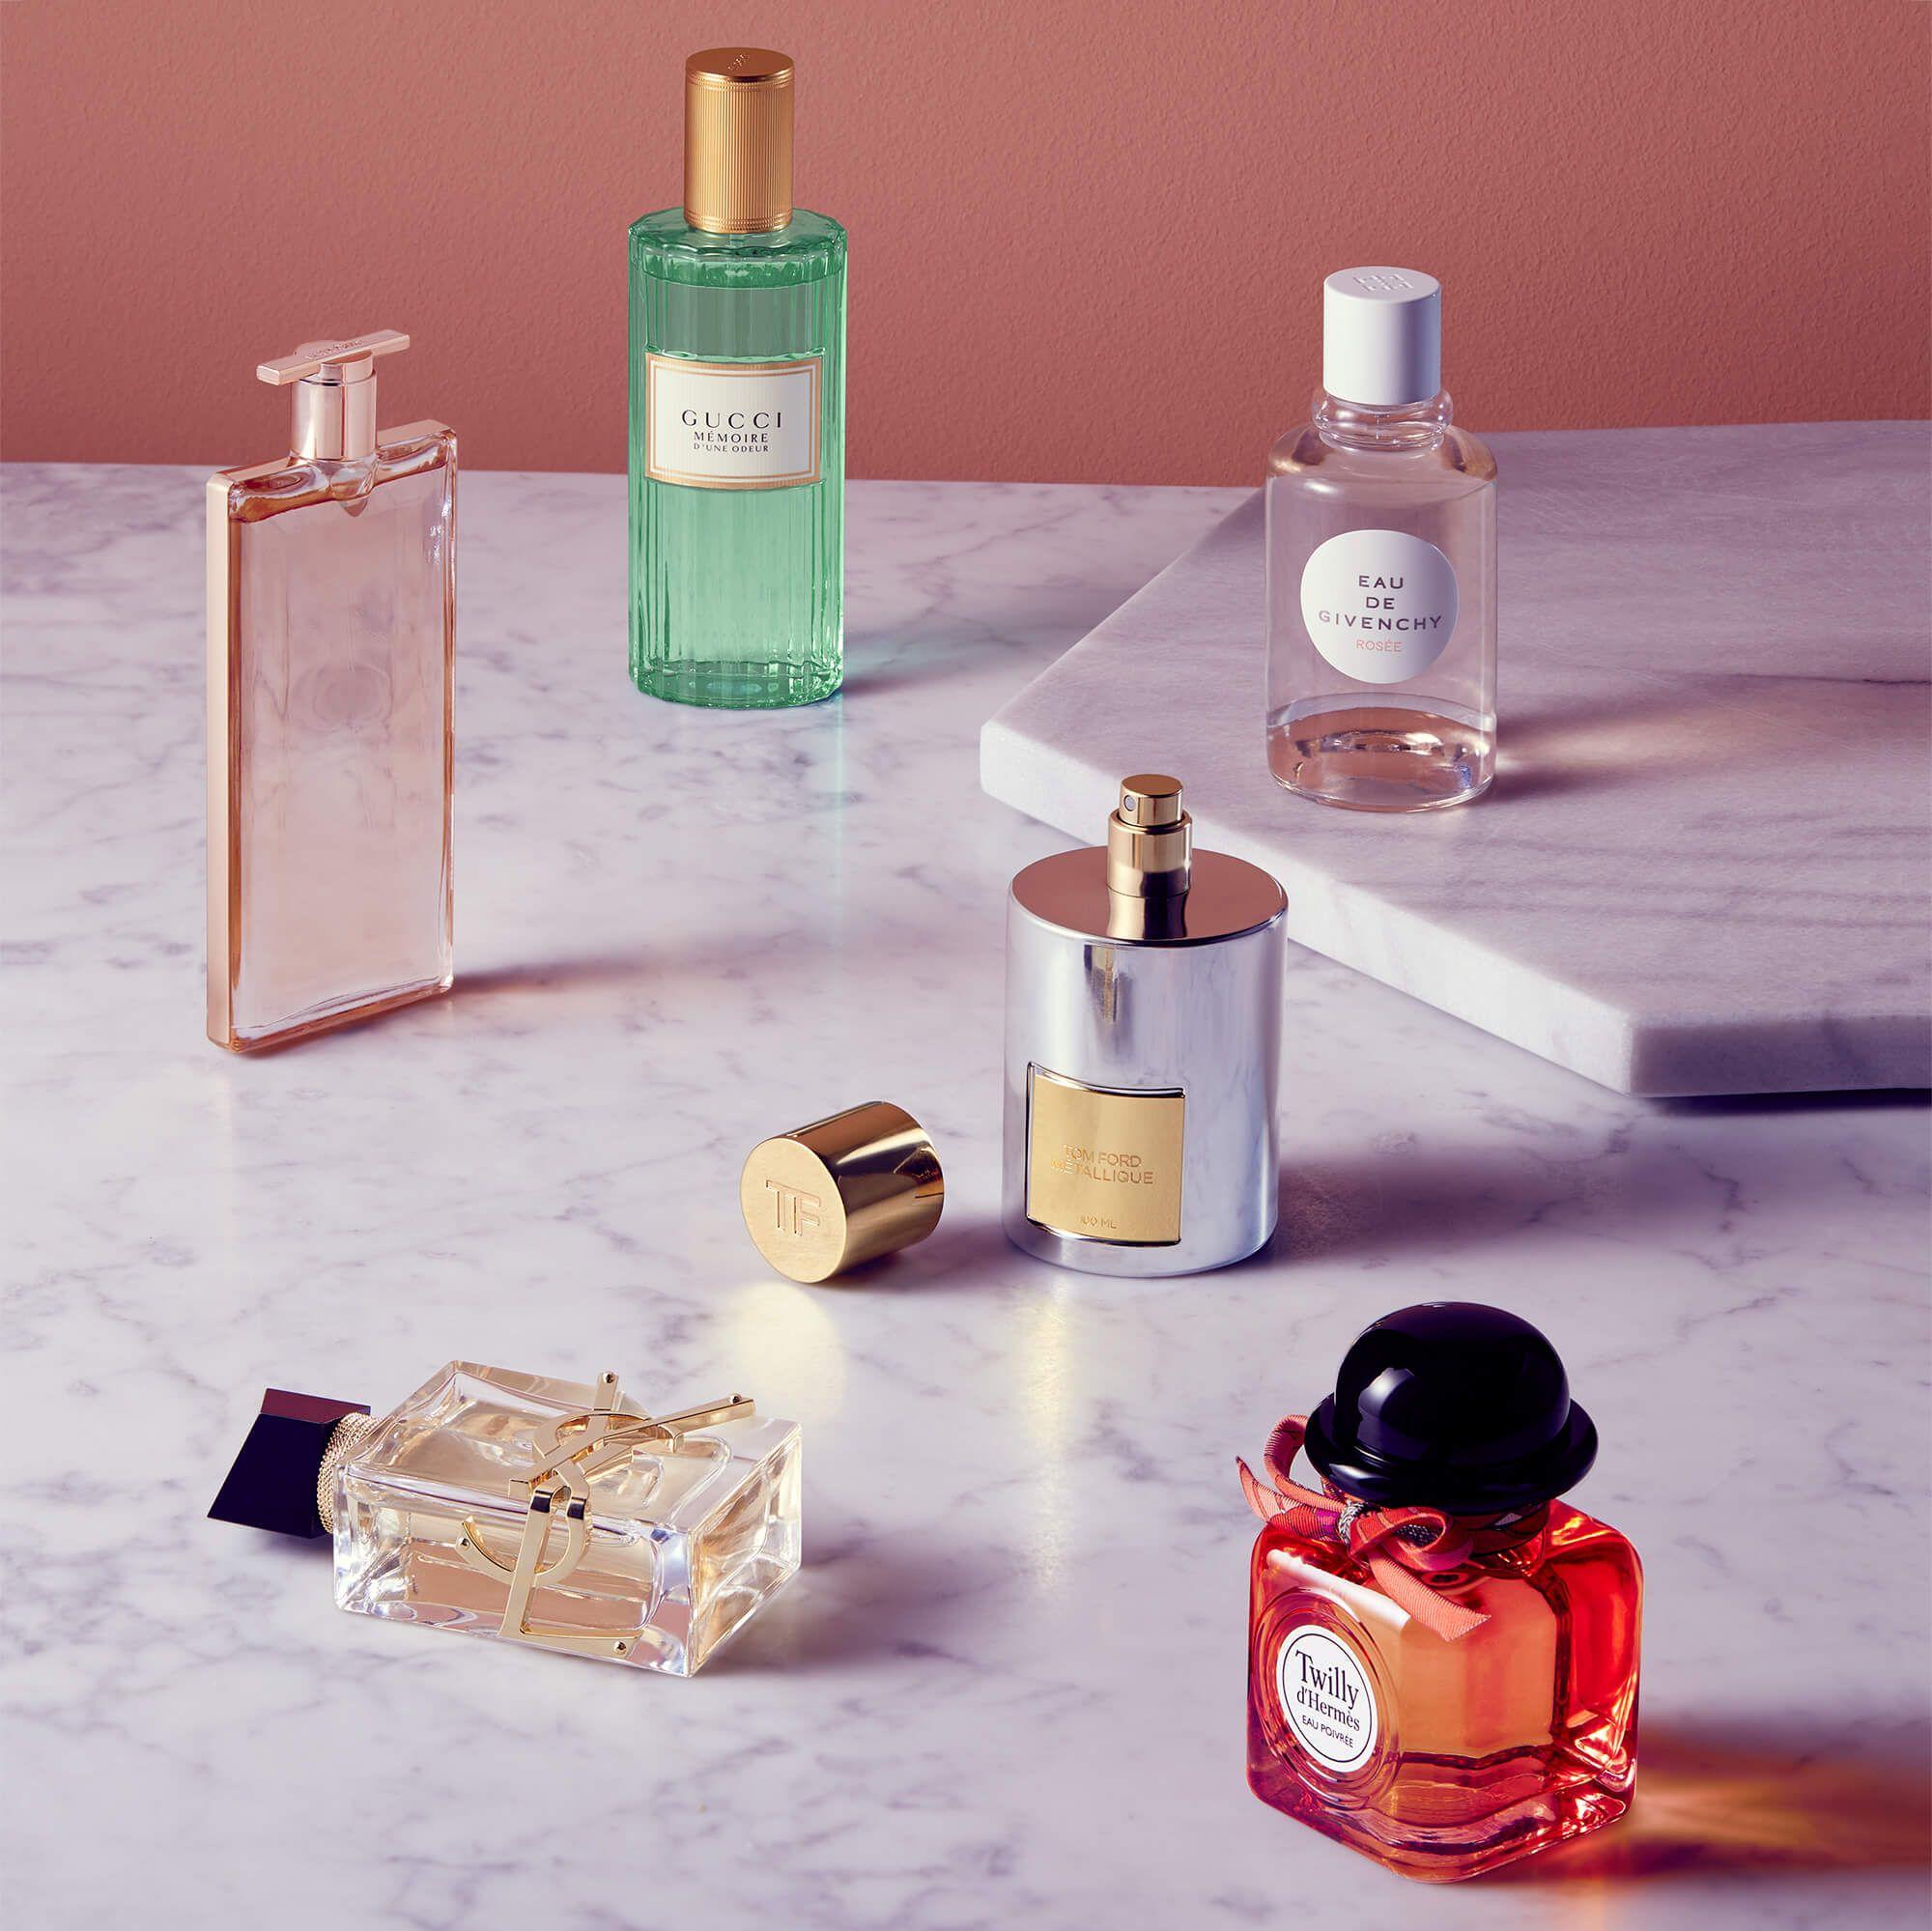 Autumn fragrance group shot